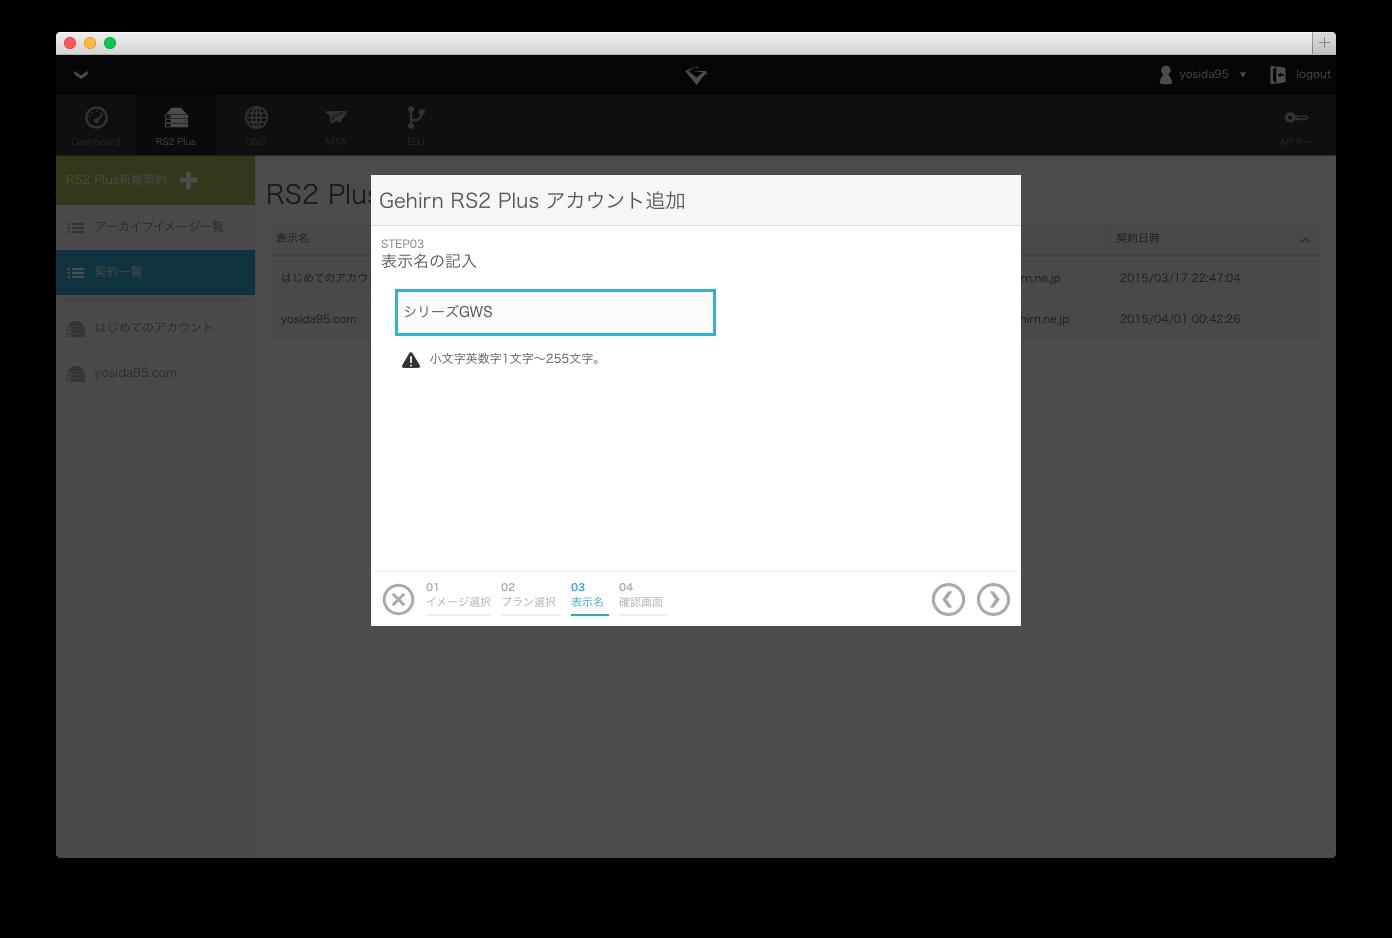 Gehirn RS2 Plus 新規アカウント作成 step3